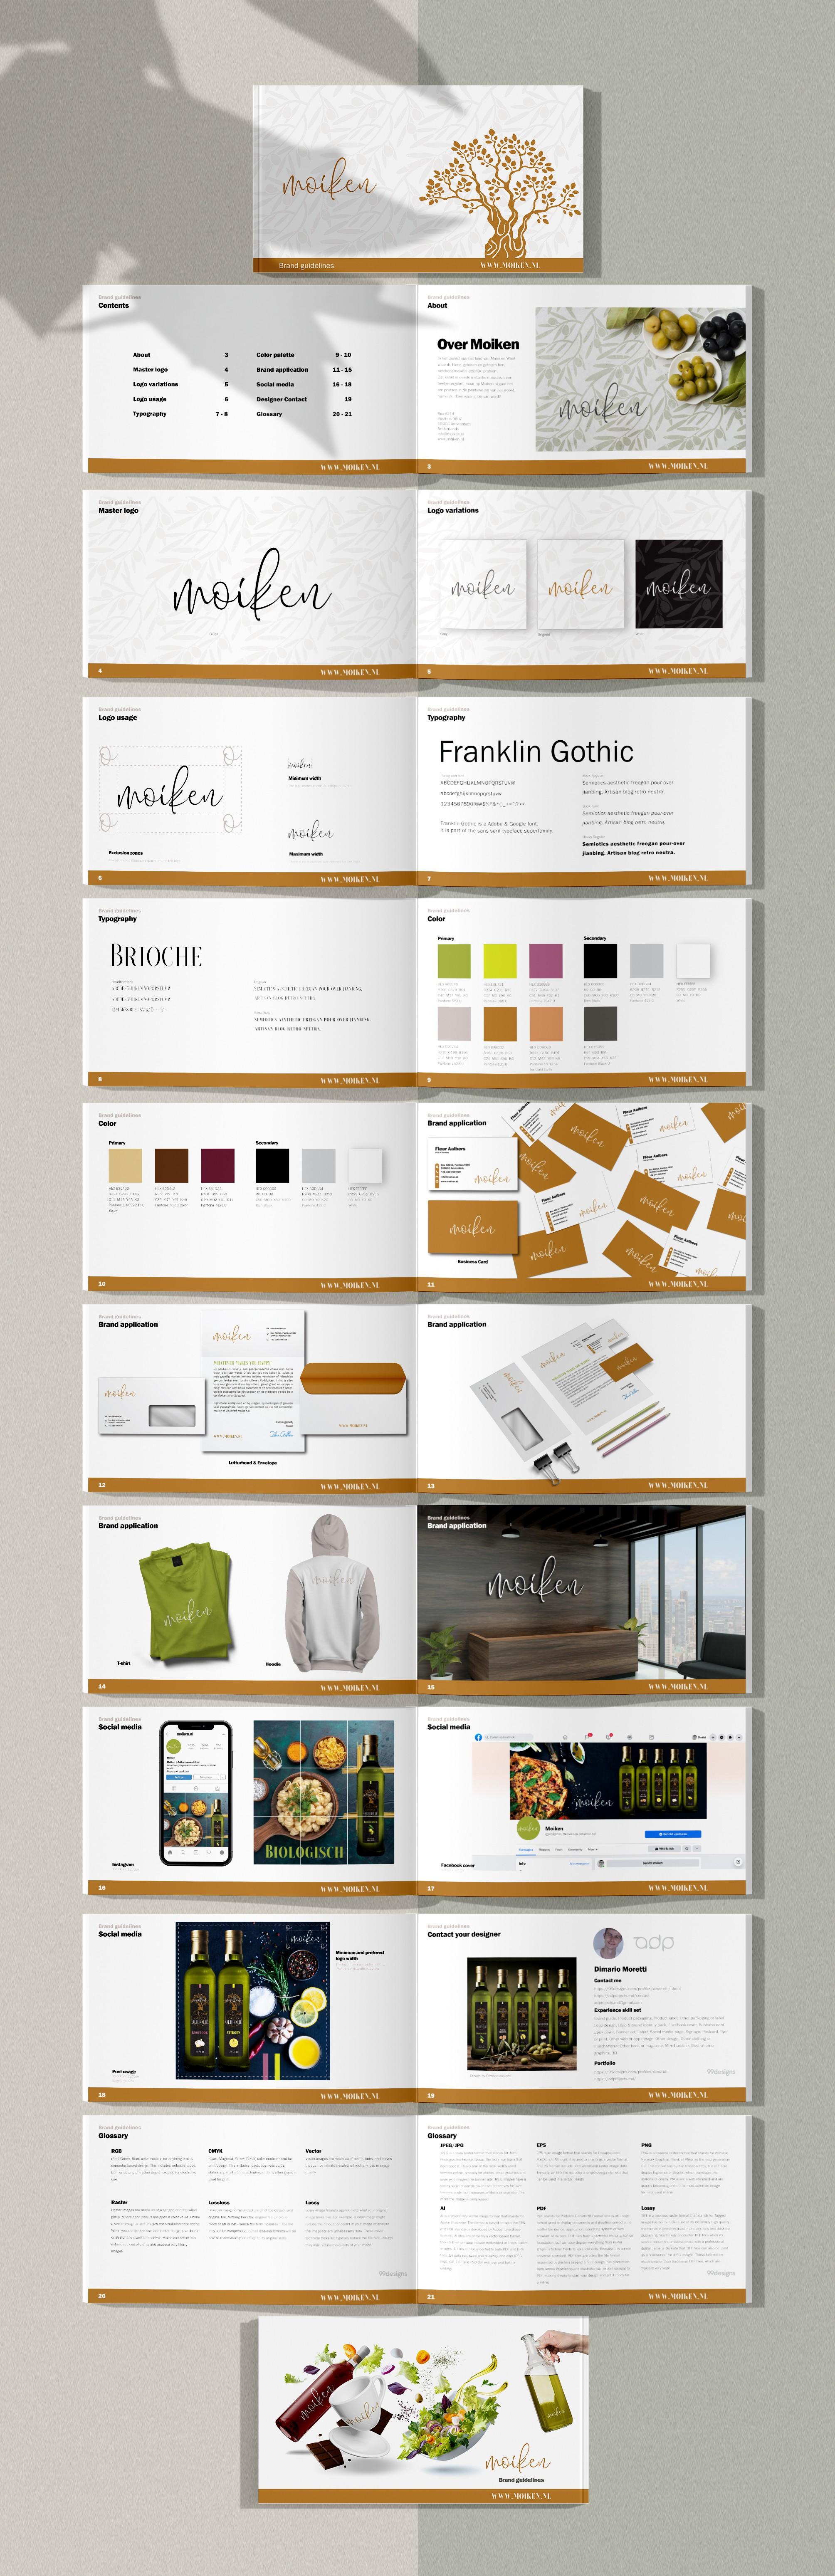 Brand Guide Moiken